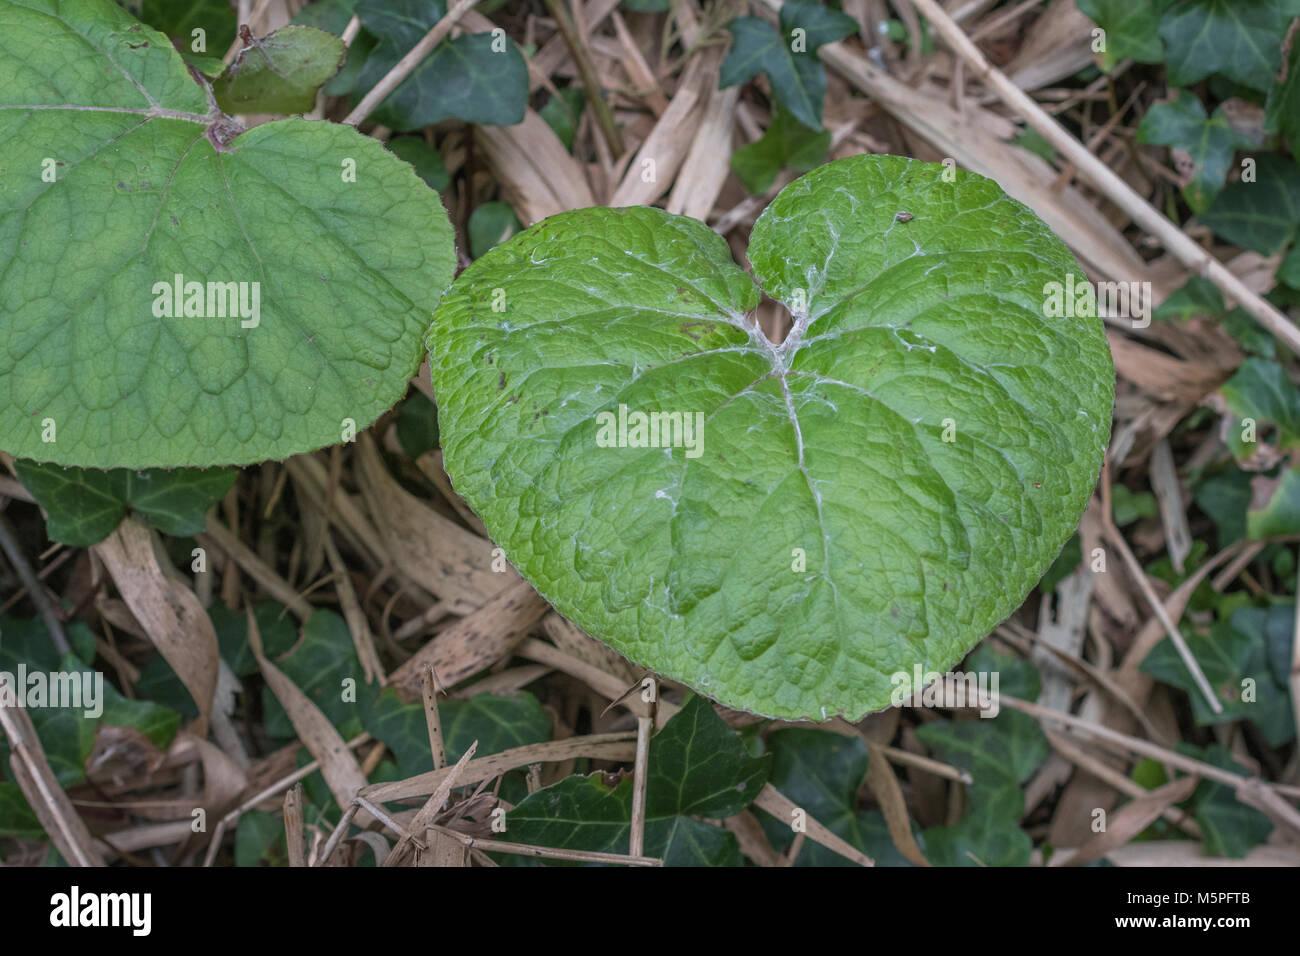 Leaves of Butterbur. Plant formerly used in herbal medicine / folk remedies. - Stock Image